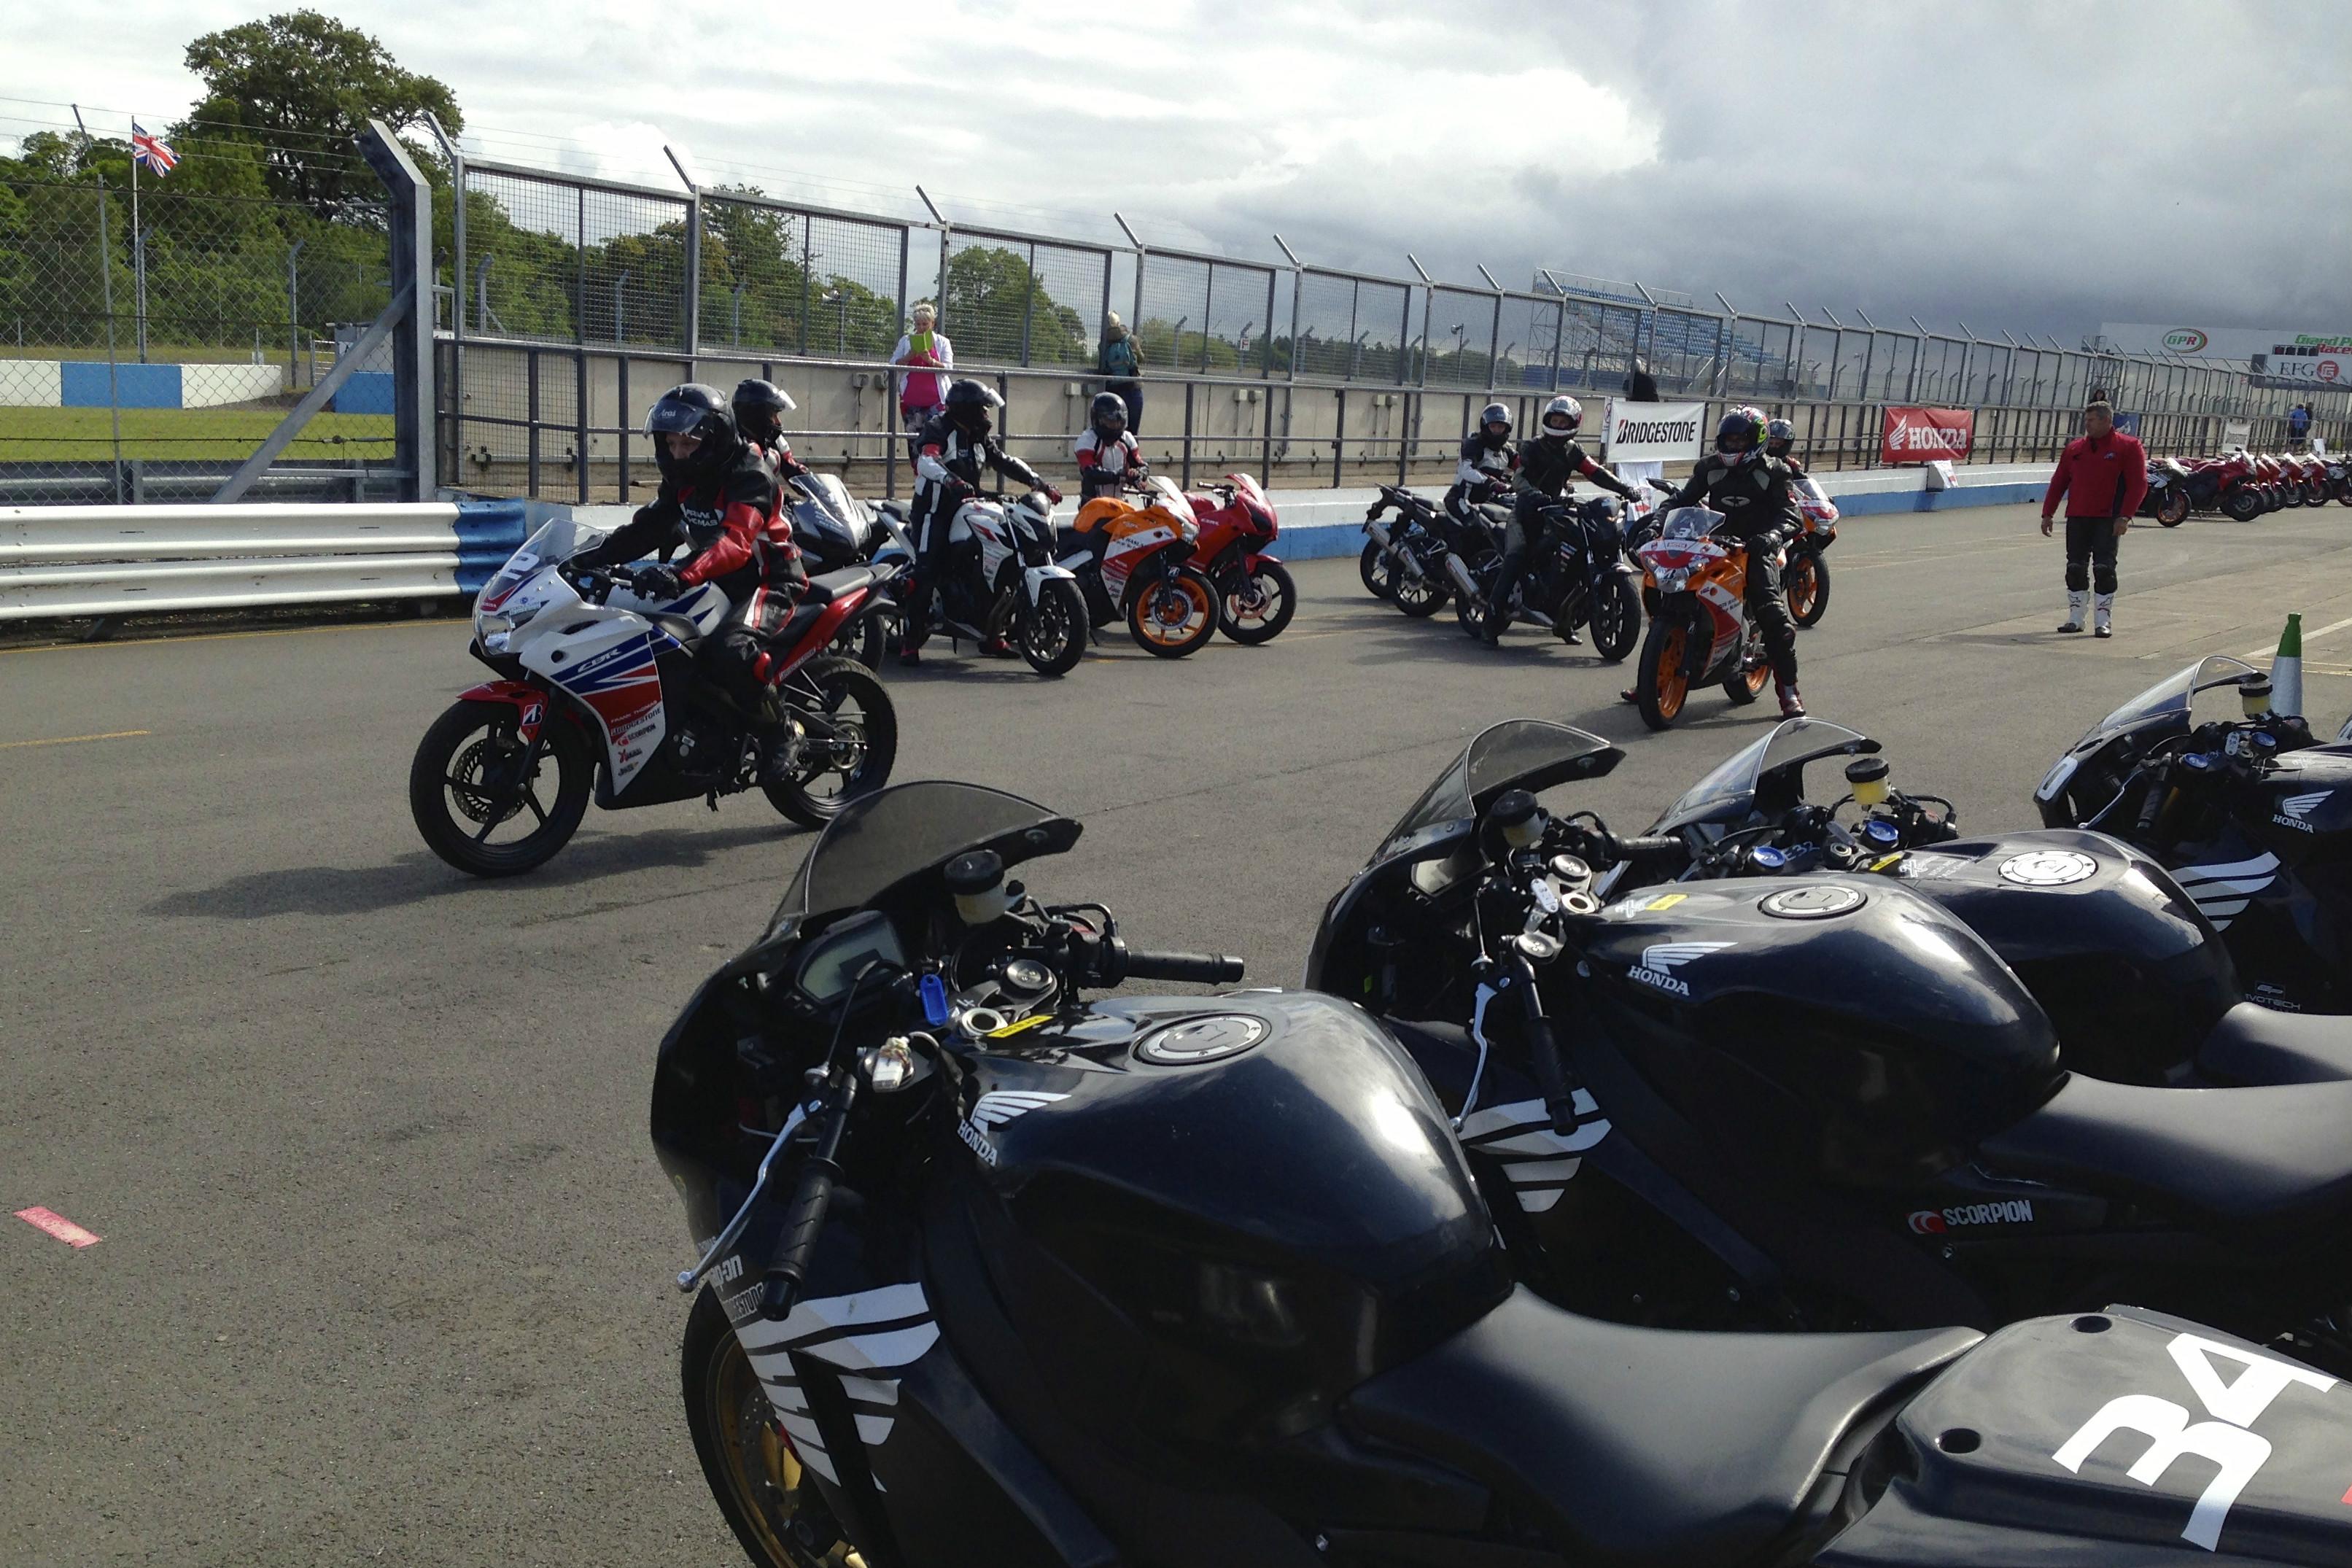 Tested: Ron Haslam Race School : By Kane Dalton